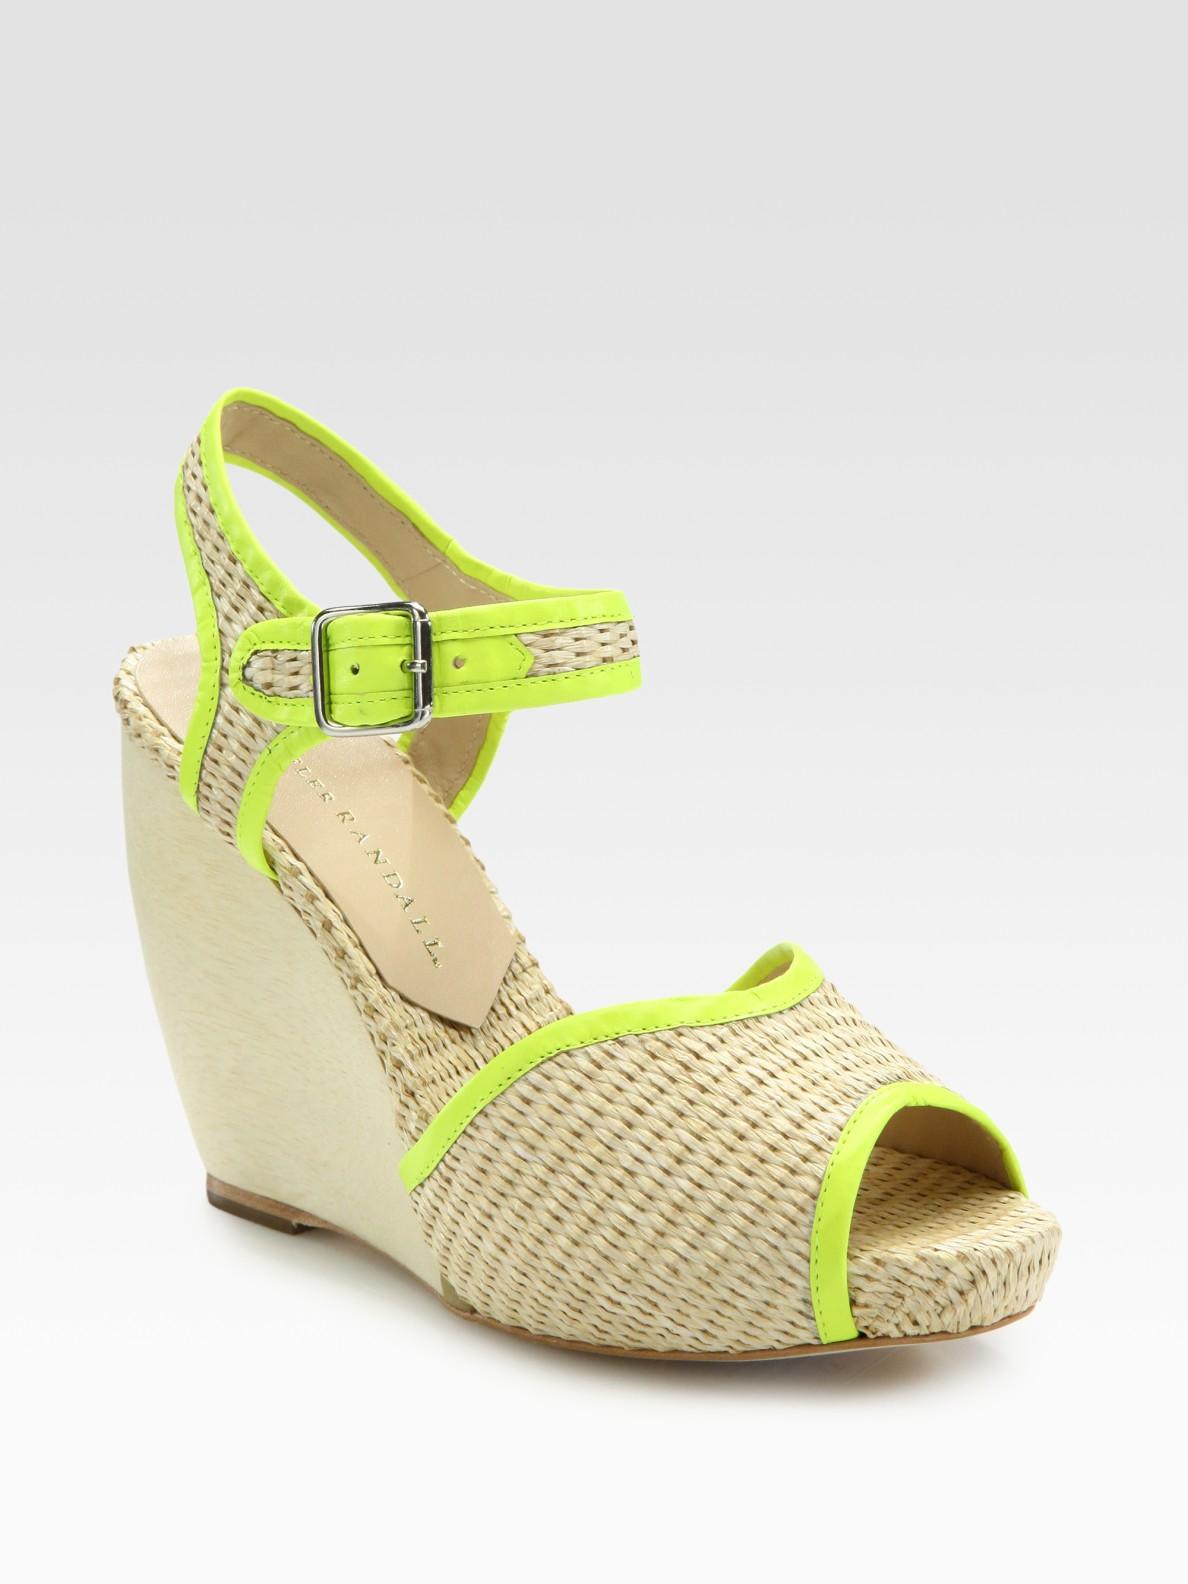 9e91bc53072 Lyst - Loeffler Randall Valentine Raffia Slingback Wedge Sandals in ...